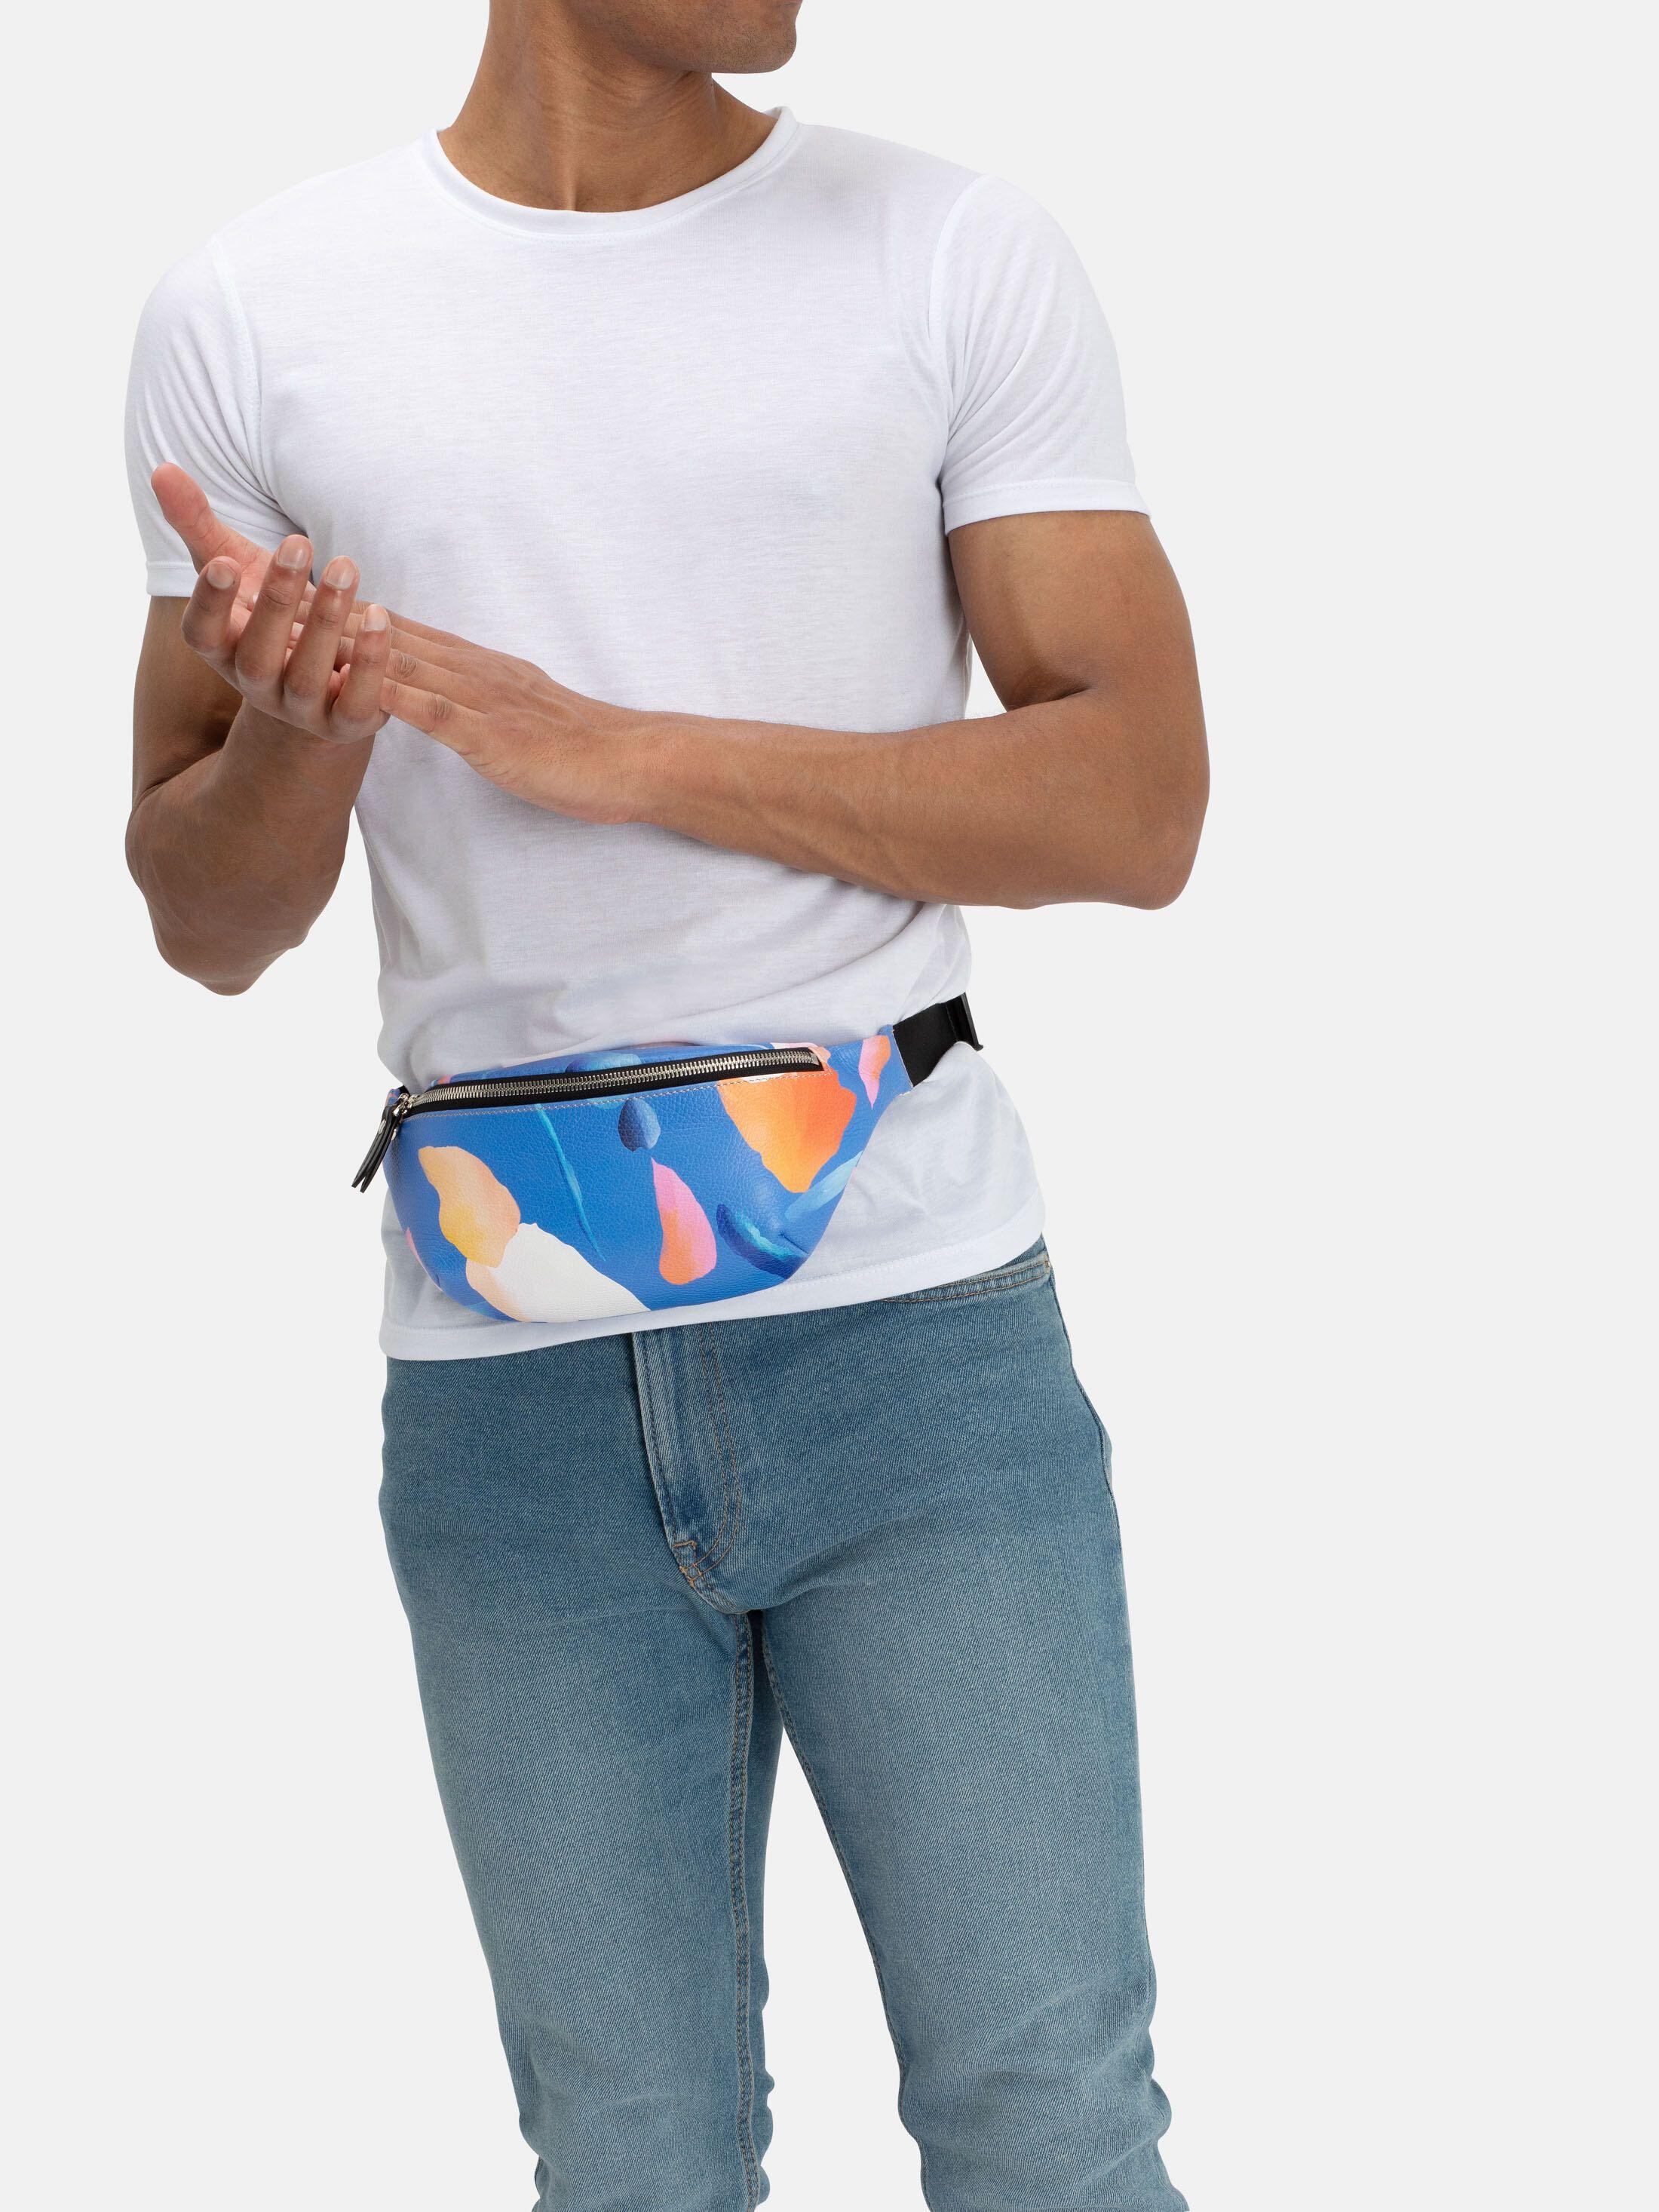 custom fanny pack buckles